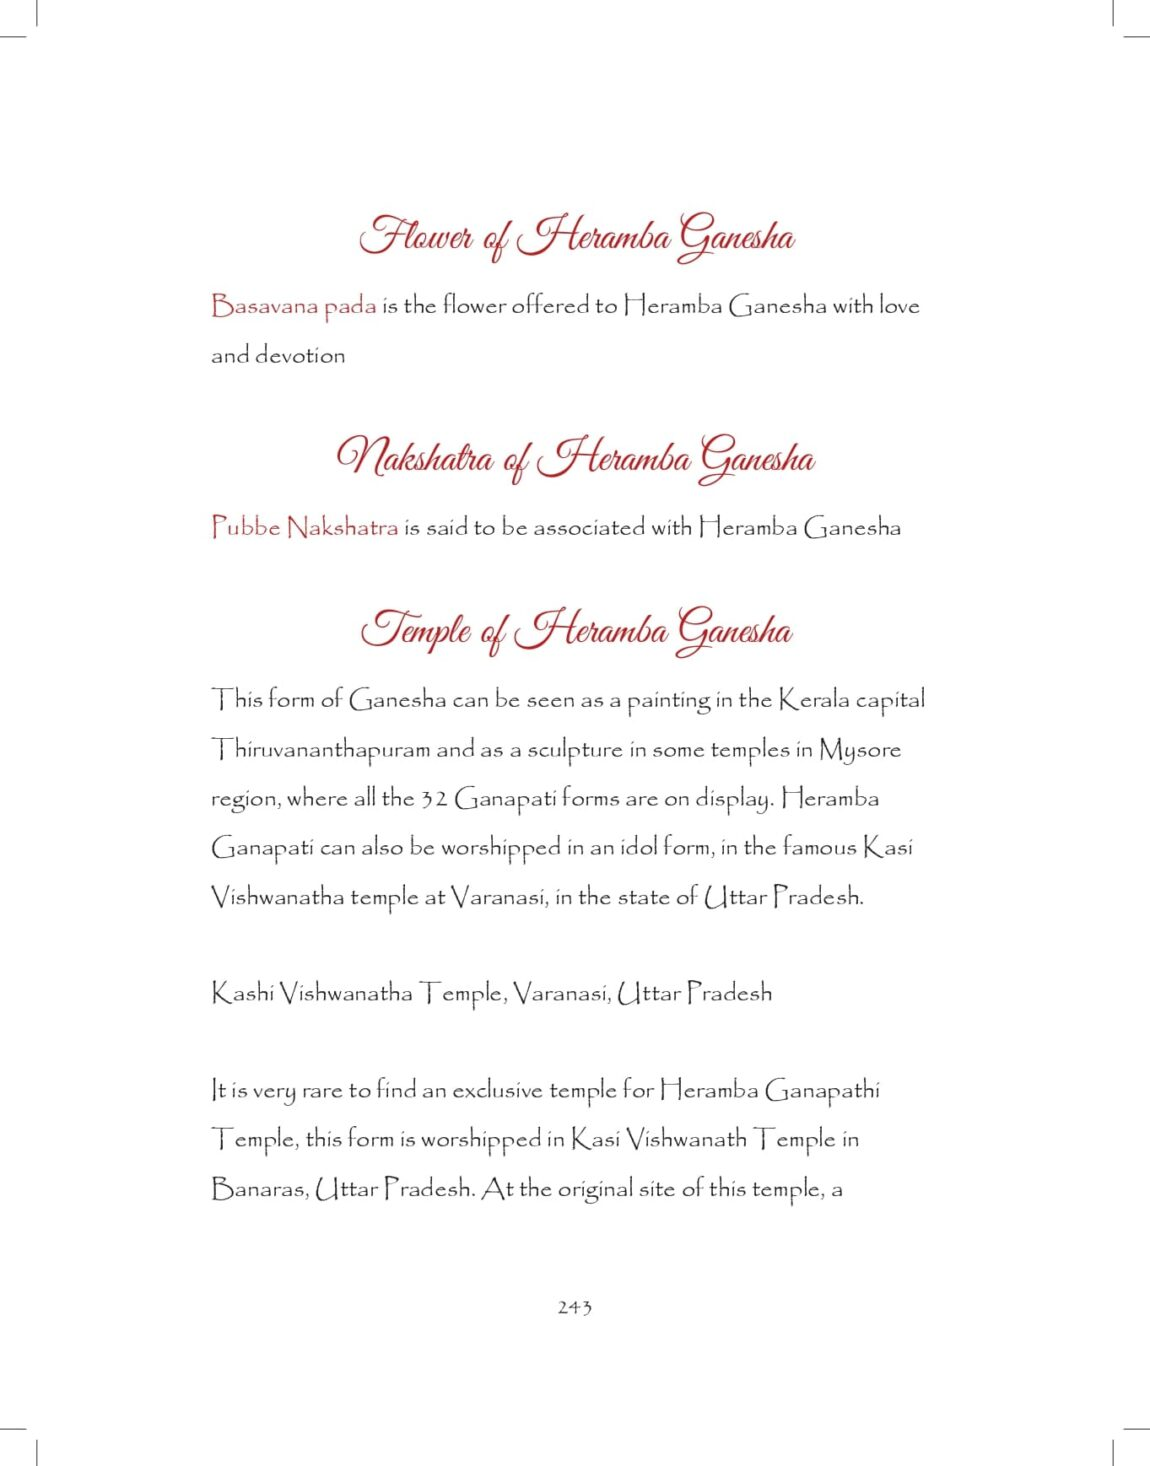 Ganesh-print_pages-to-jpg-0243.jpg